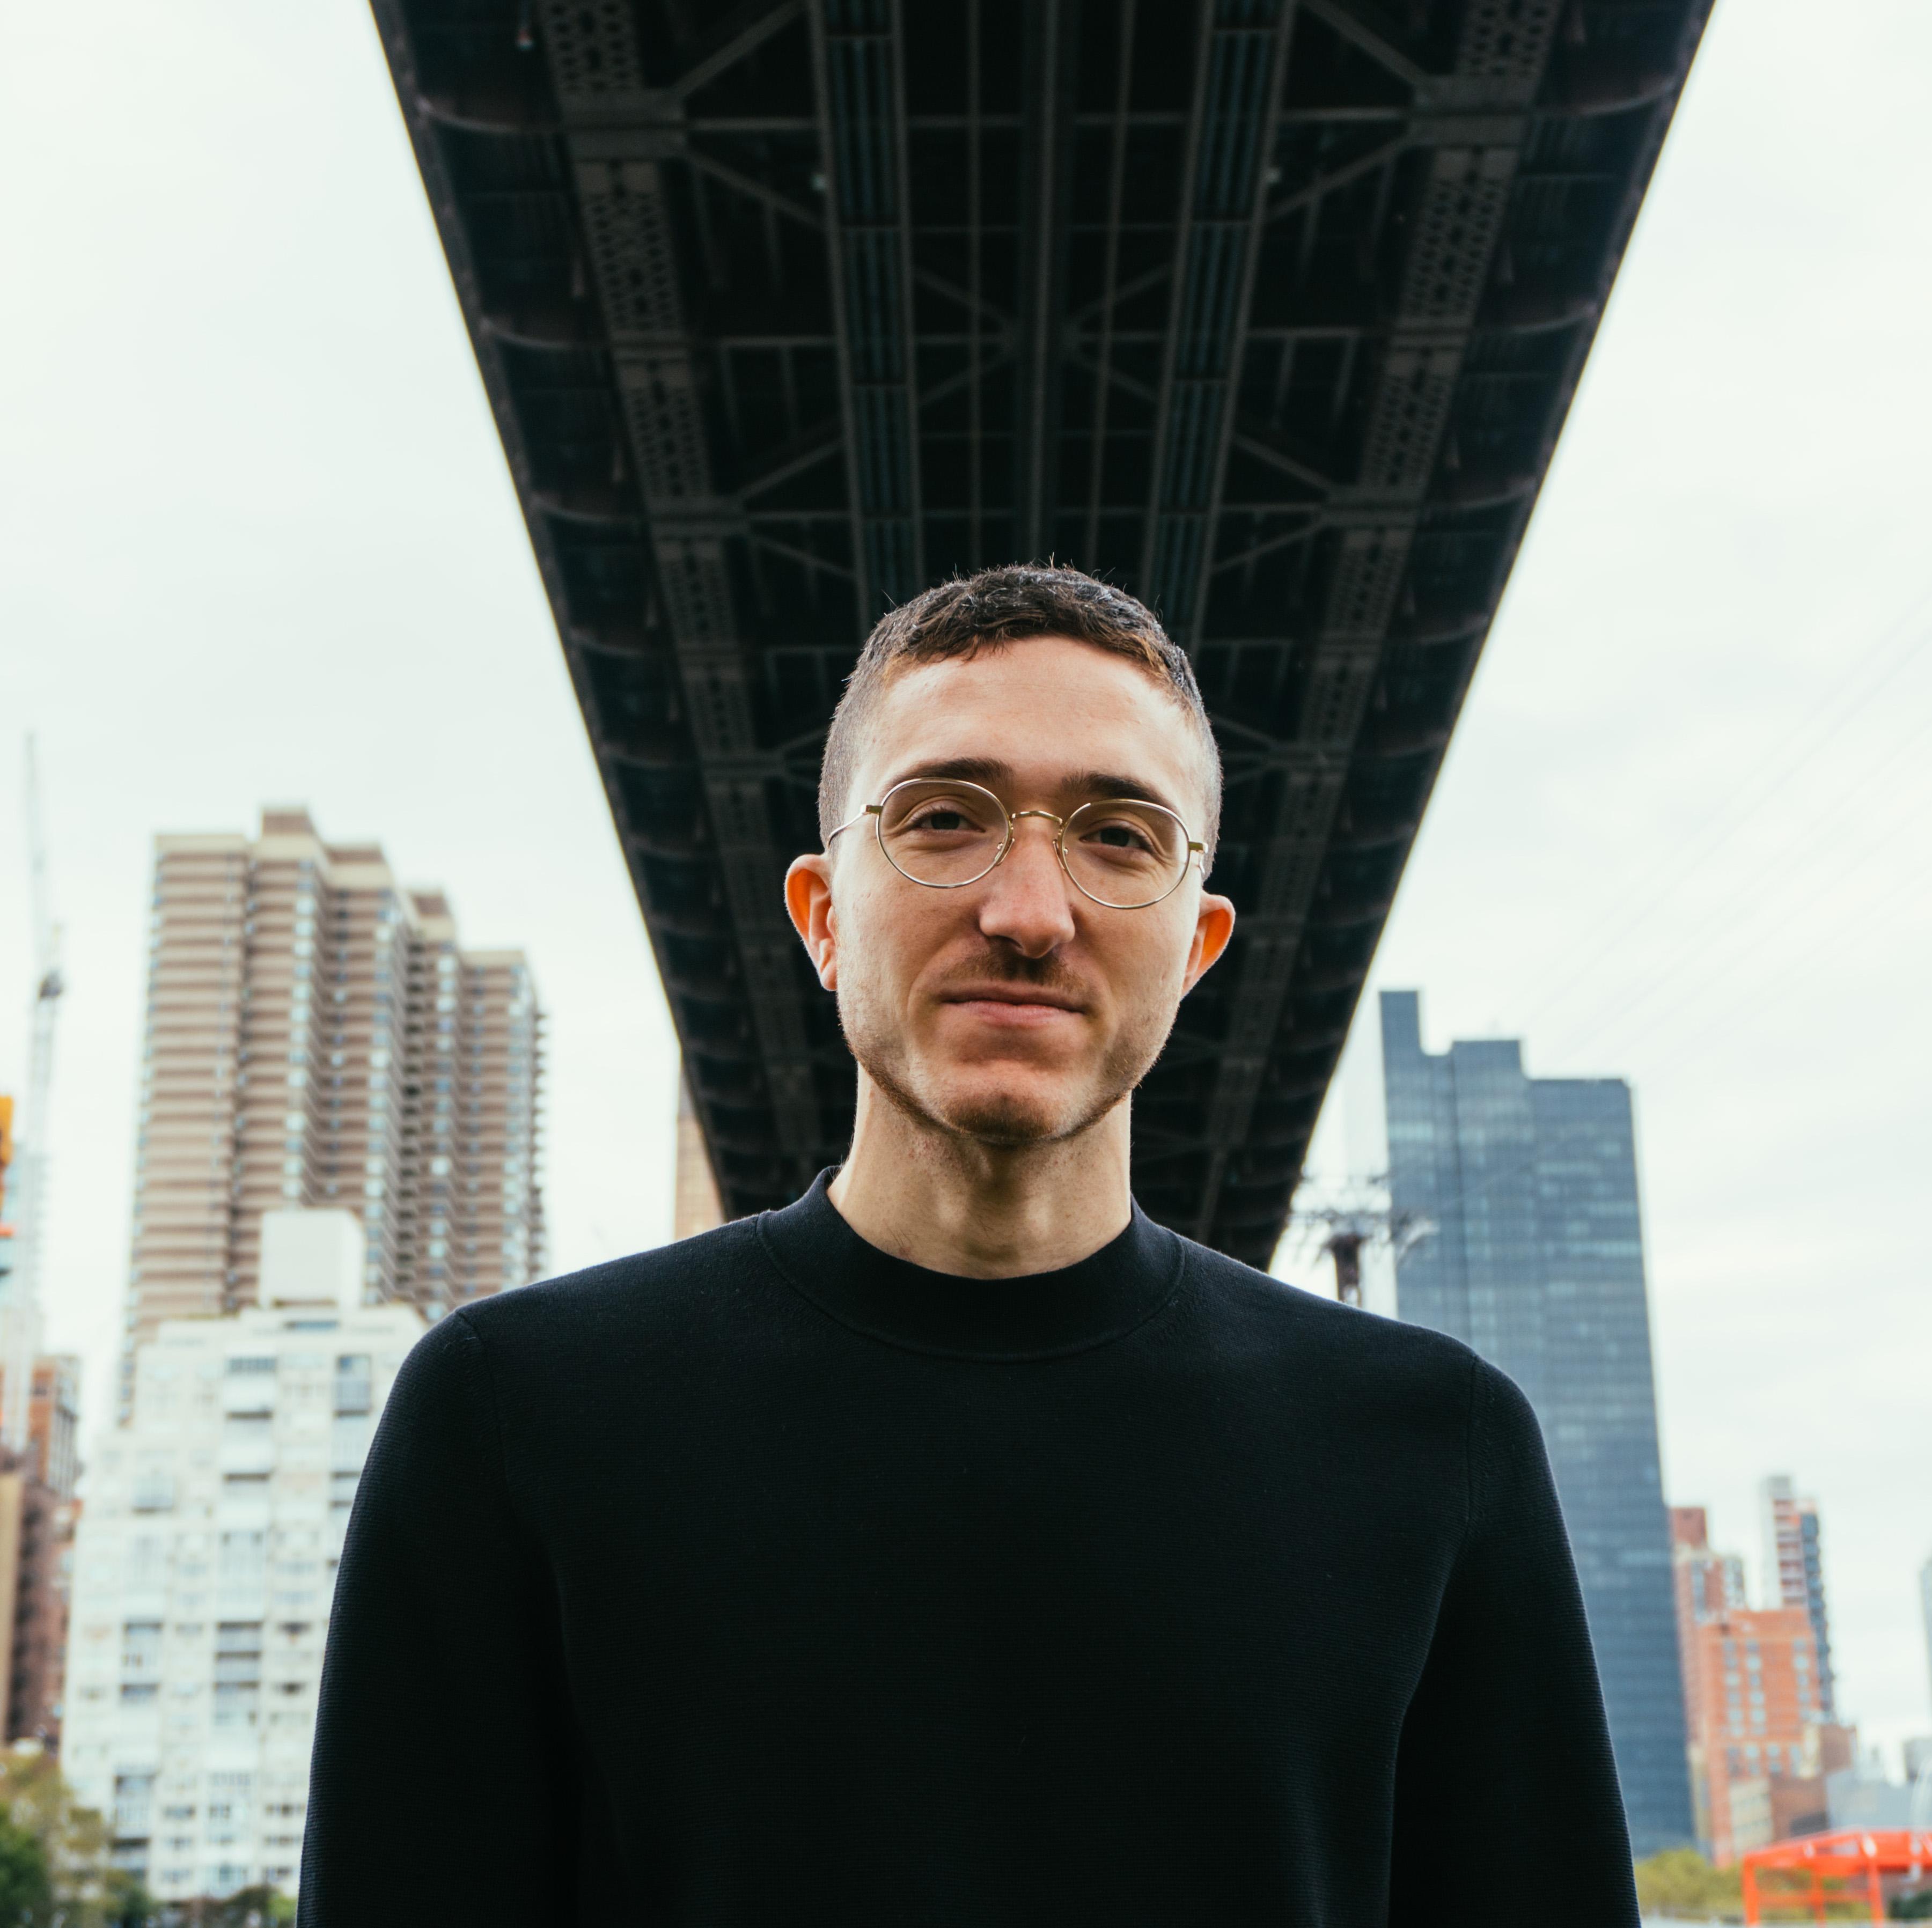 Kyle Tieman-Strauss, 2017